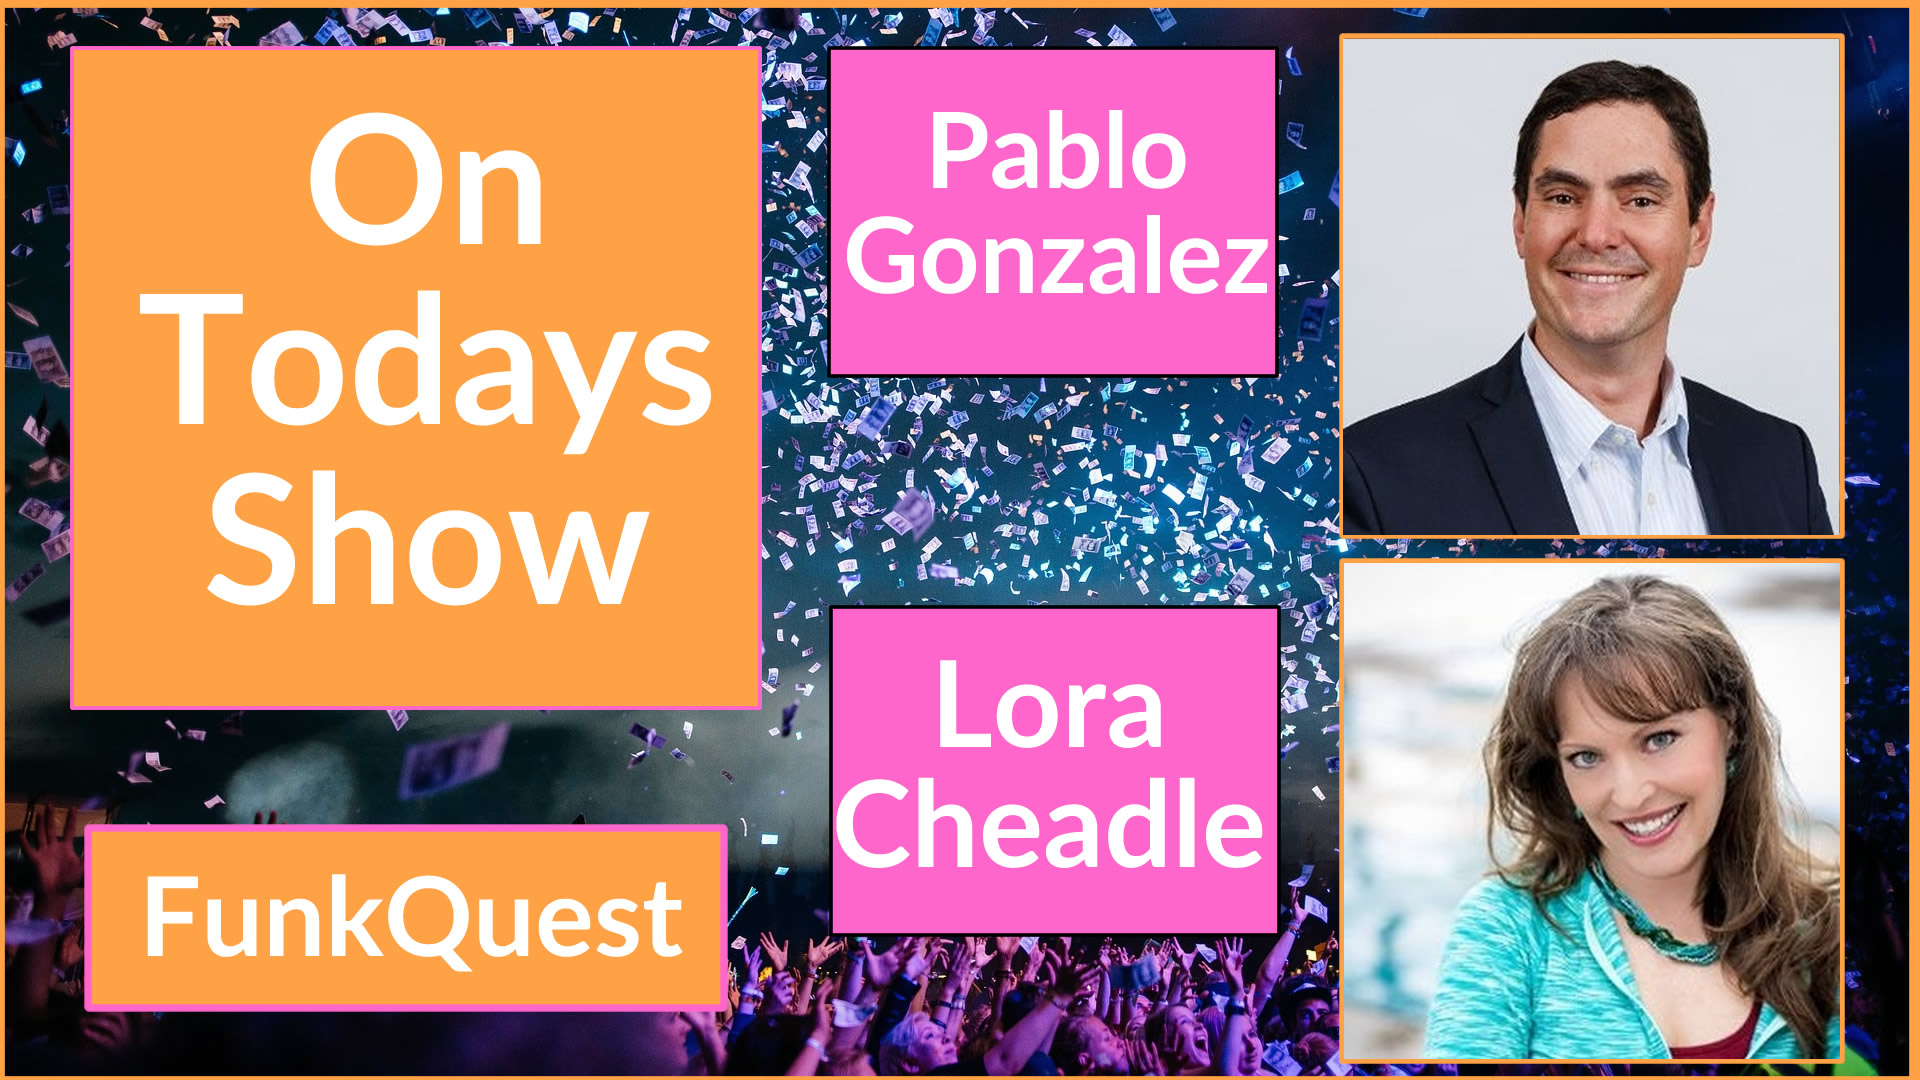 on todays show Lora v Pablo